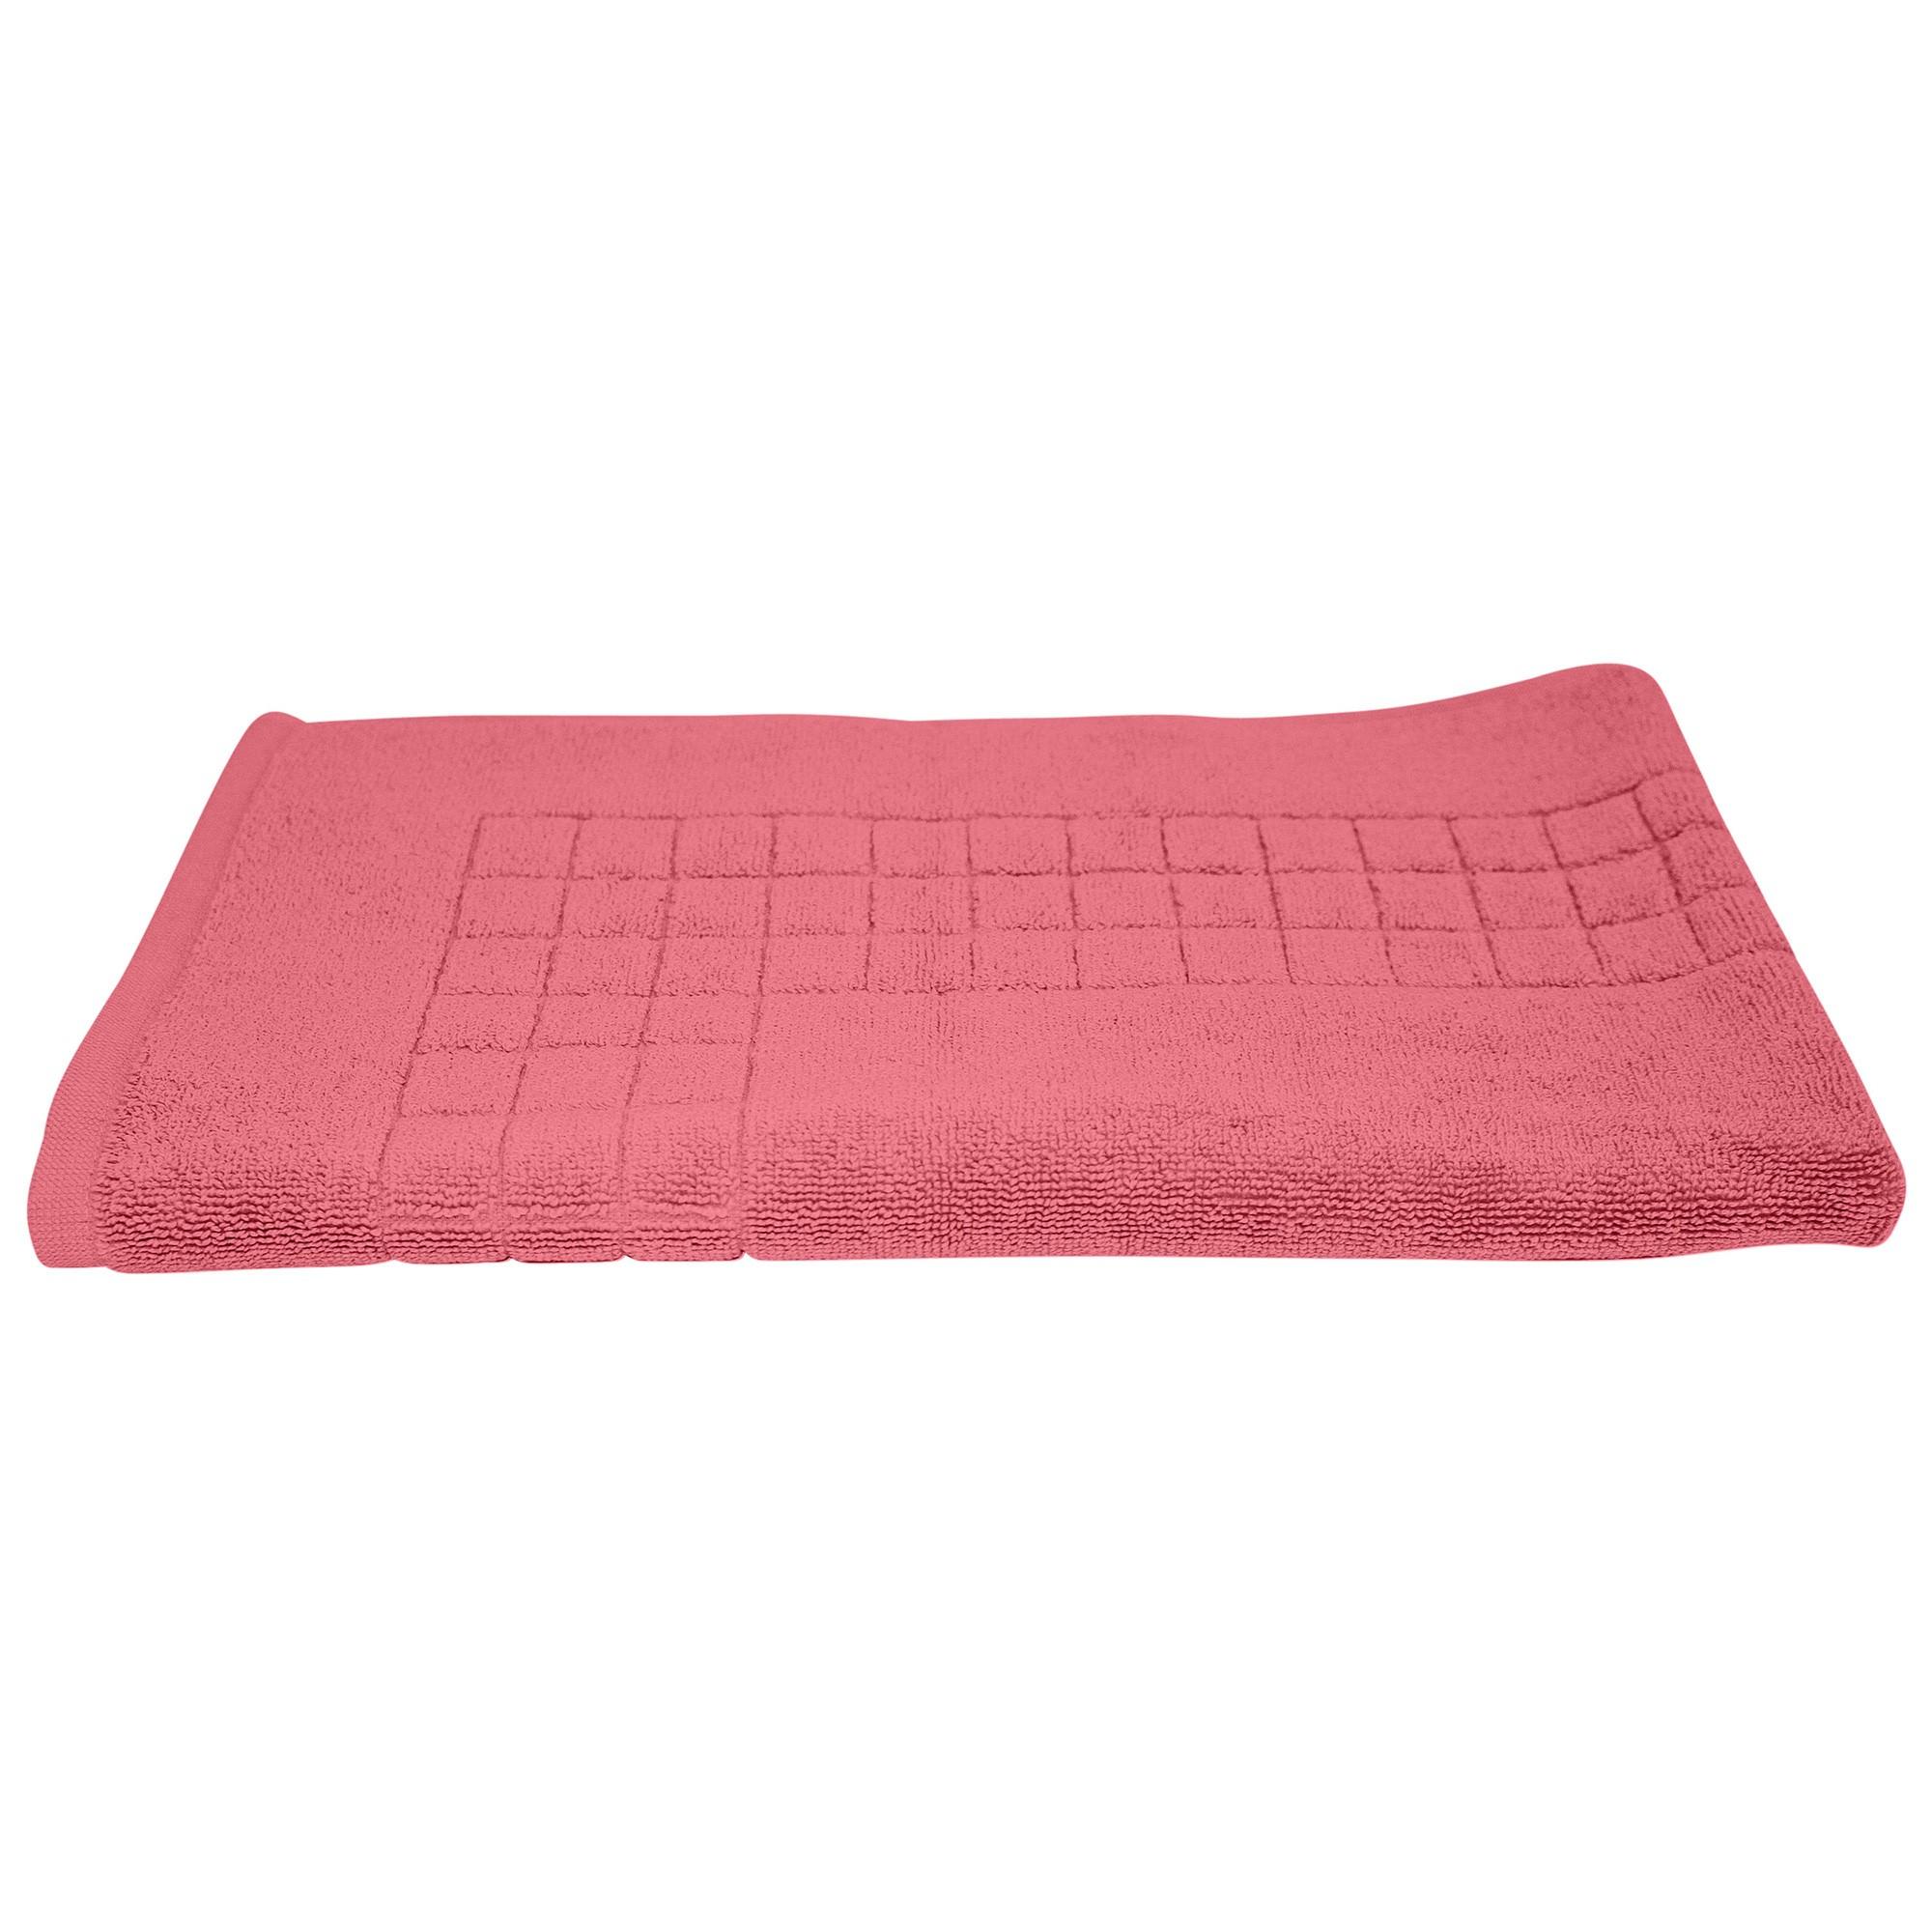 Odyssey Living Meridian Cotton Bath Mat, Desert Rose